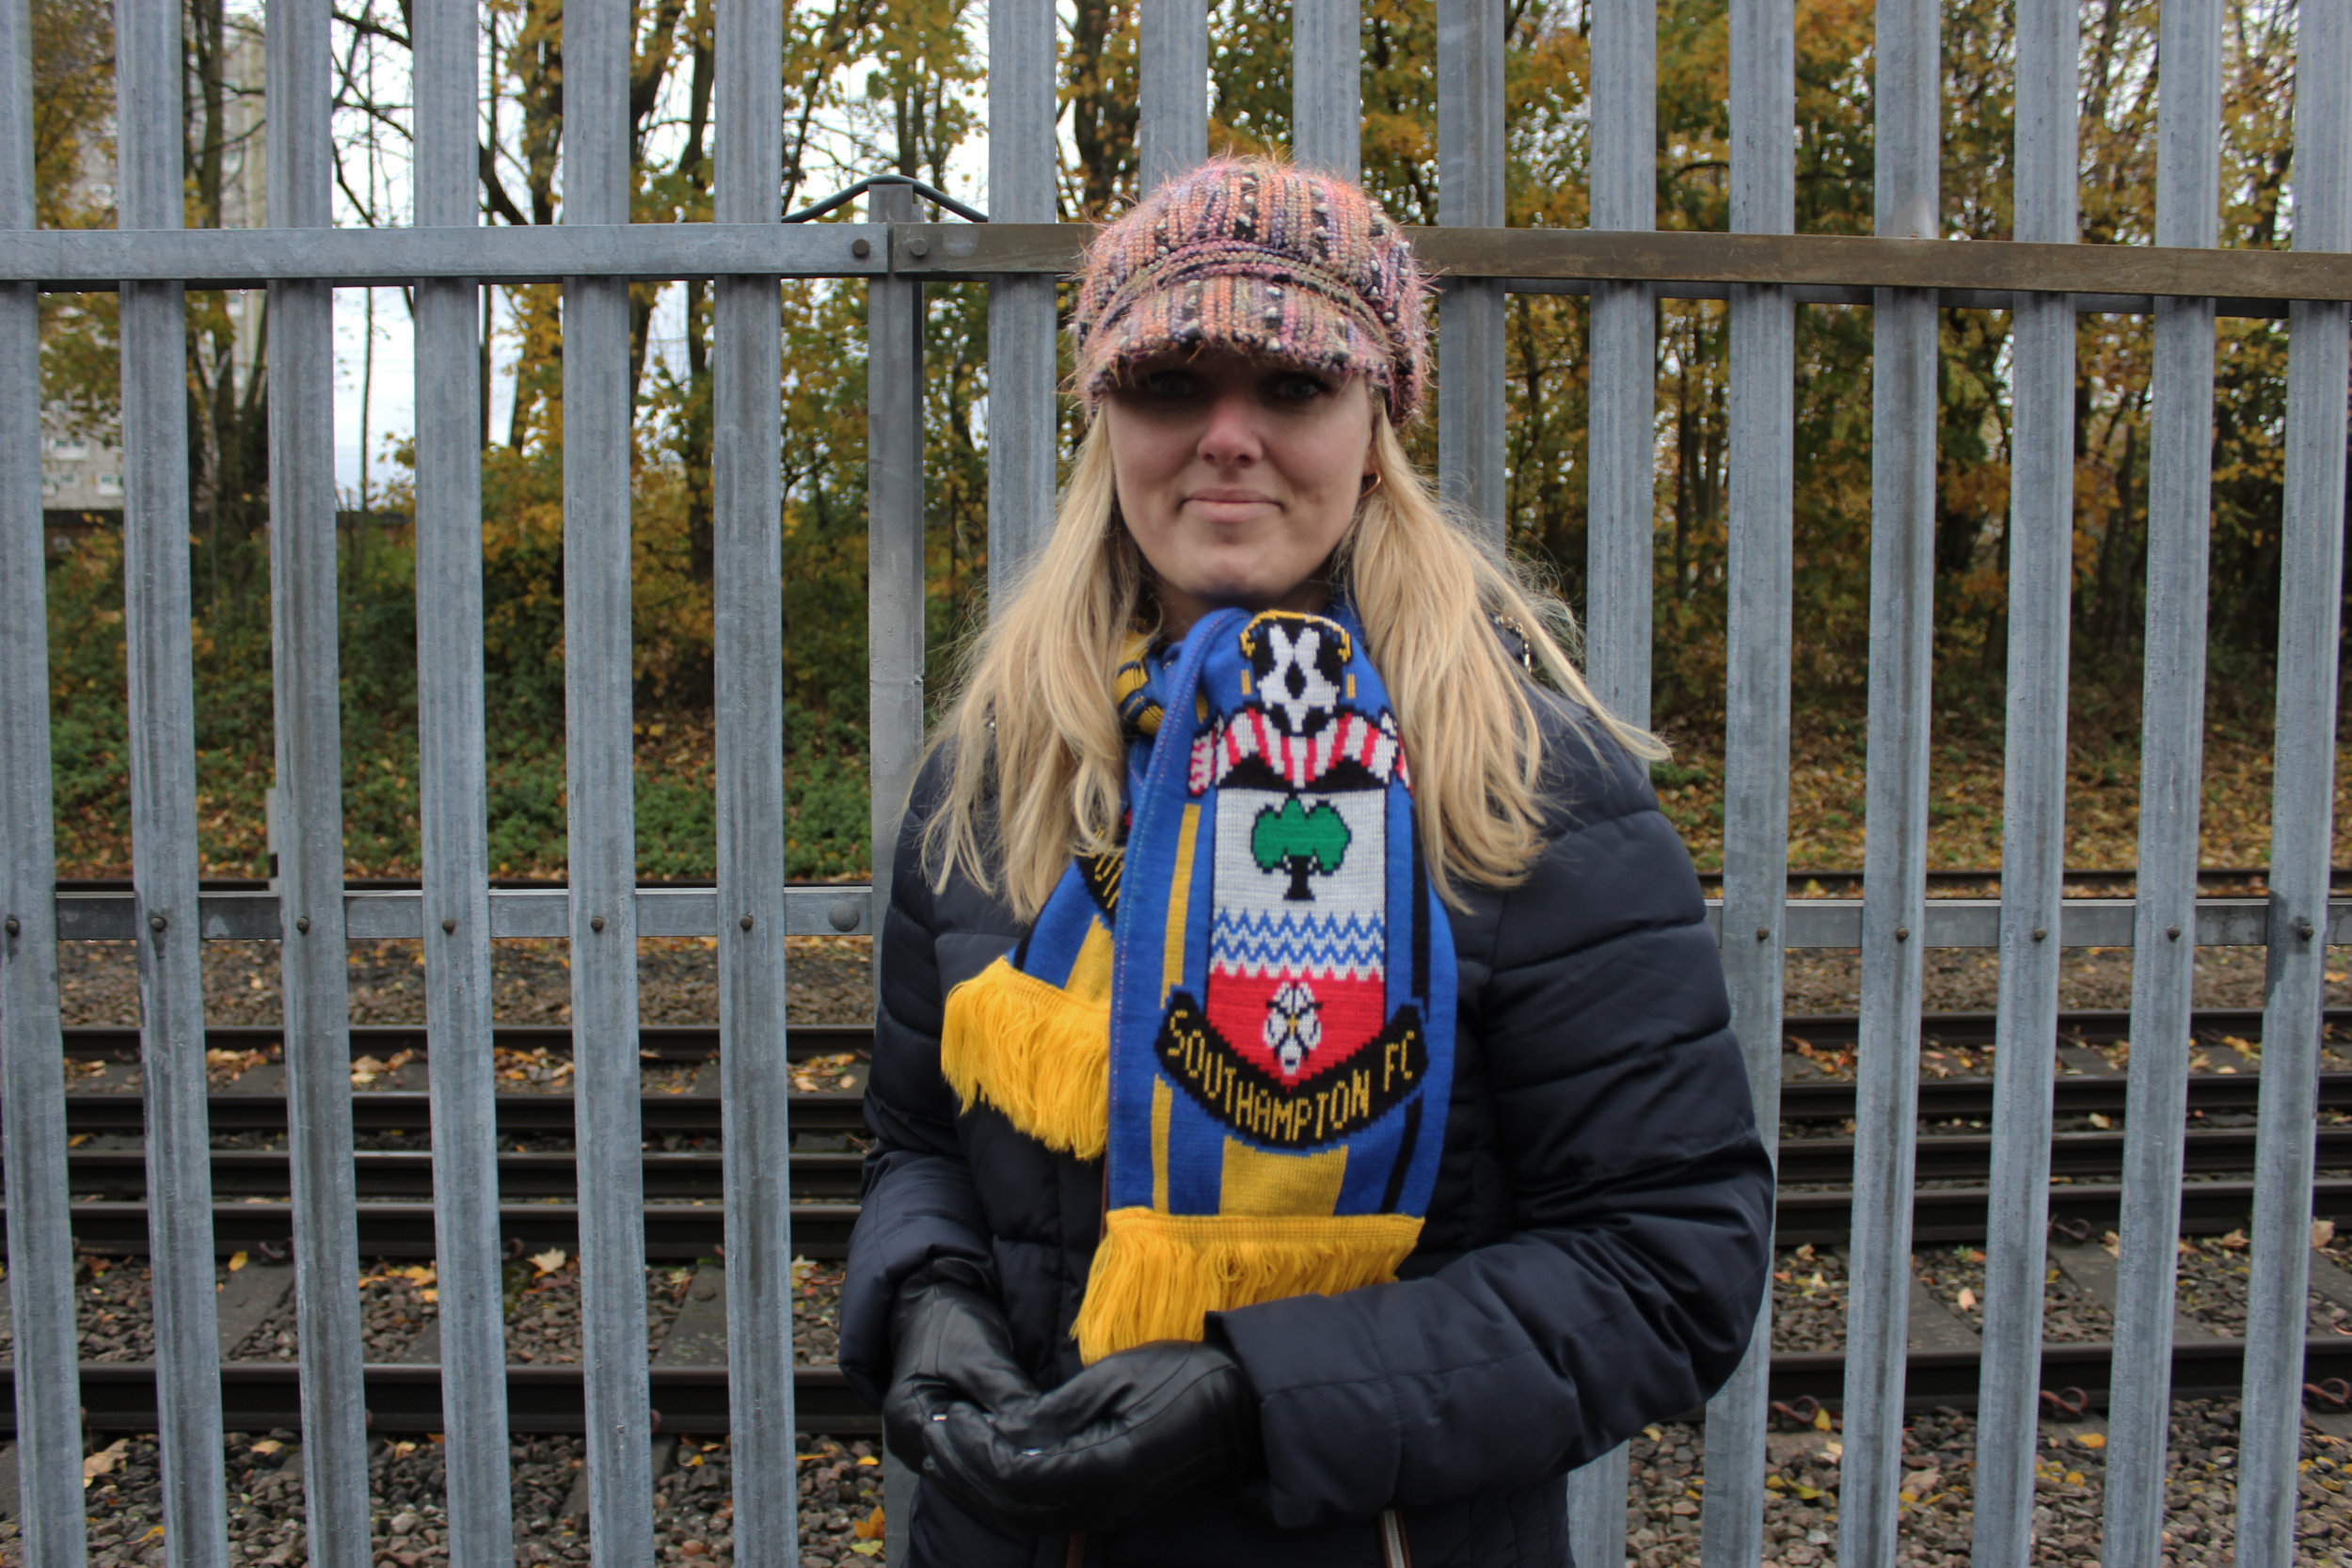 Southampton Female Football Fan - This Fan Girl